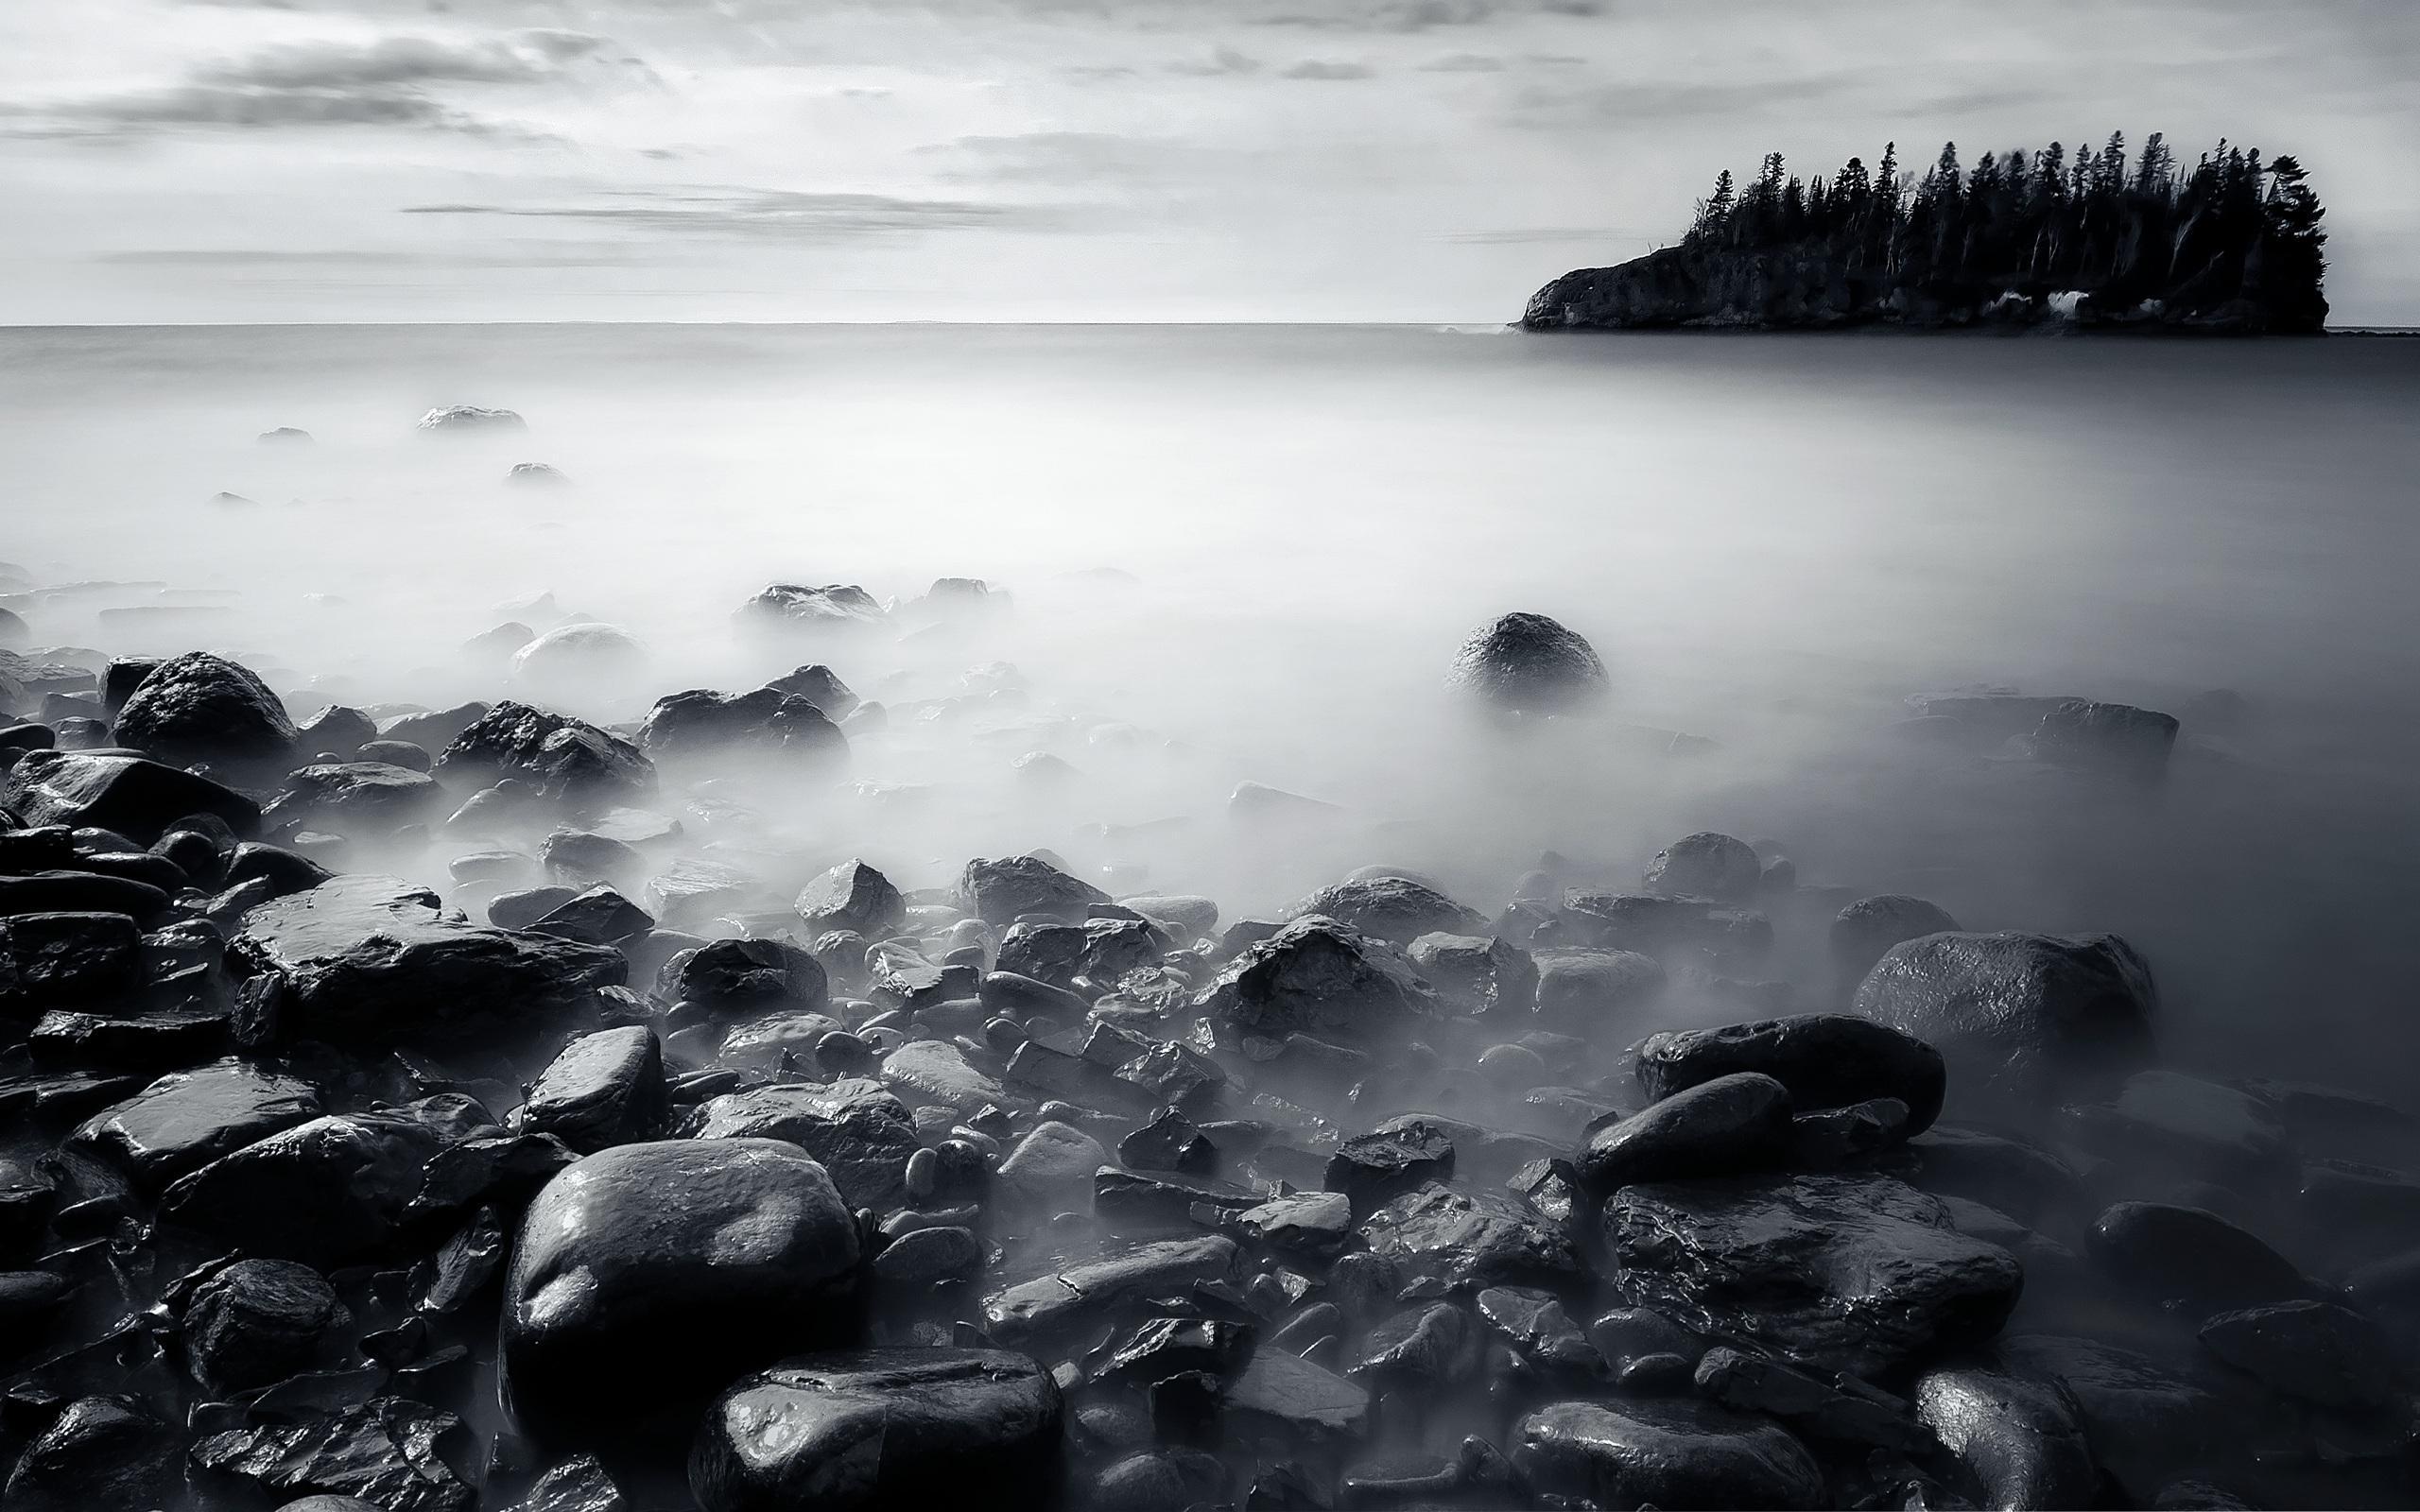 Lake Superior Wallpaper